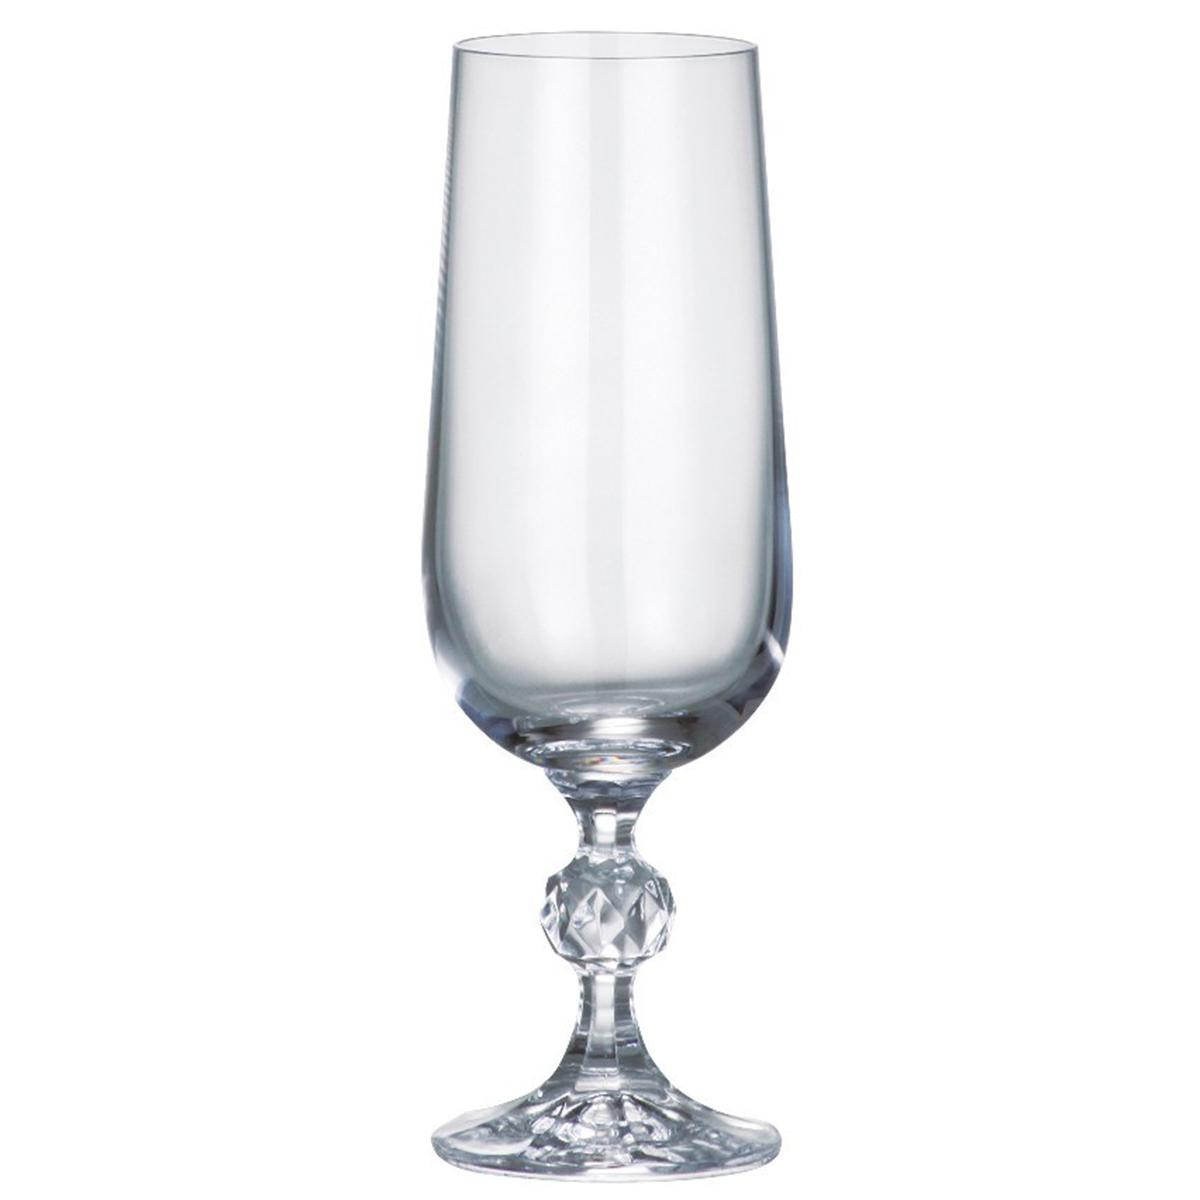 Набор бокалов для шампанского Bohemia Crystal Клаудия, 180 мл, 6 шт. 40149/180 набор бокалов для бренди коралл 40600 q8105 400 анжела